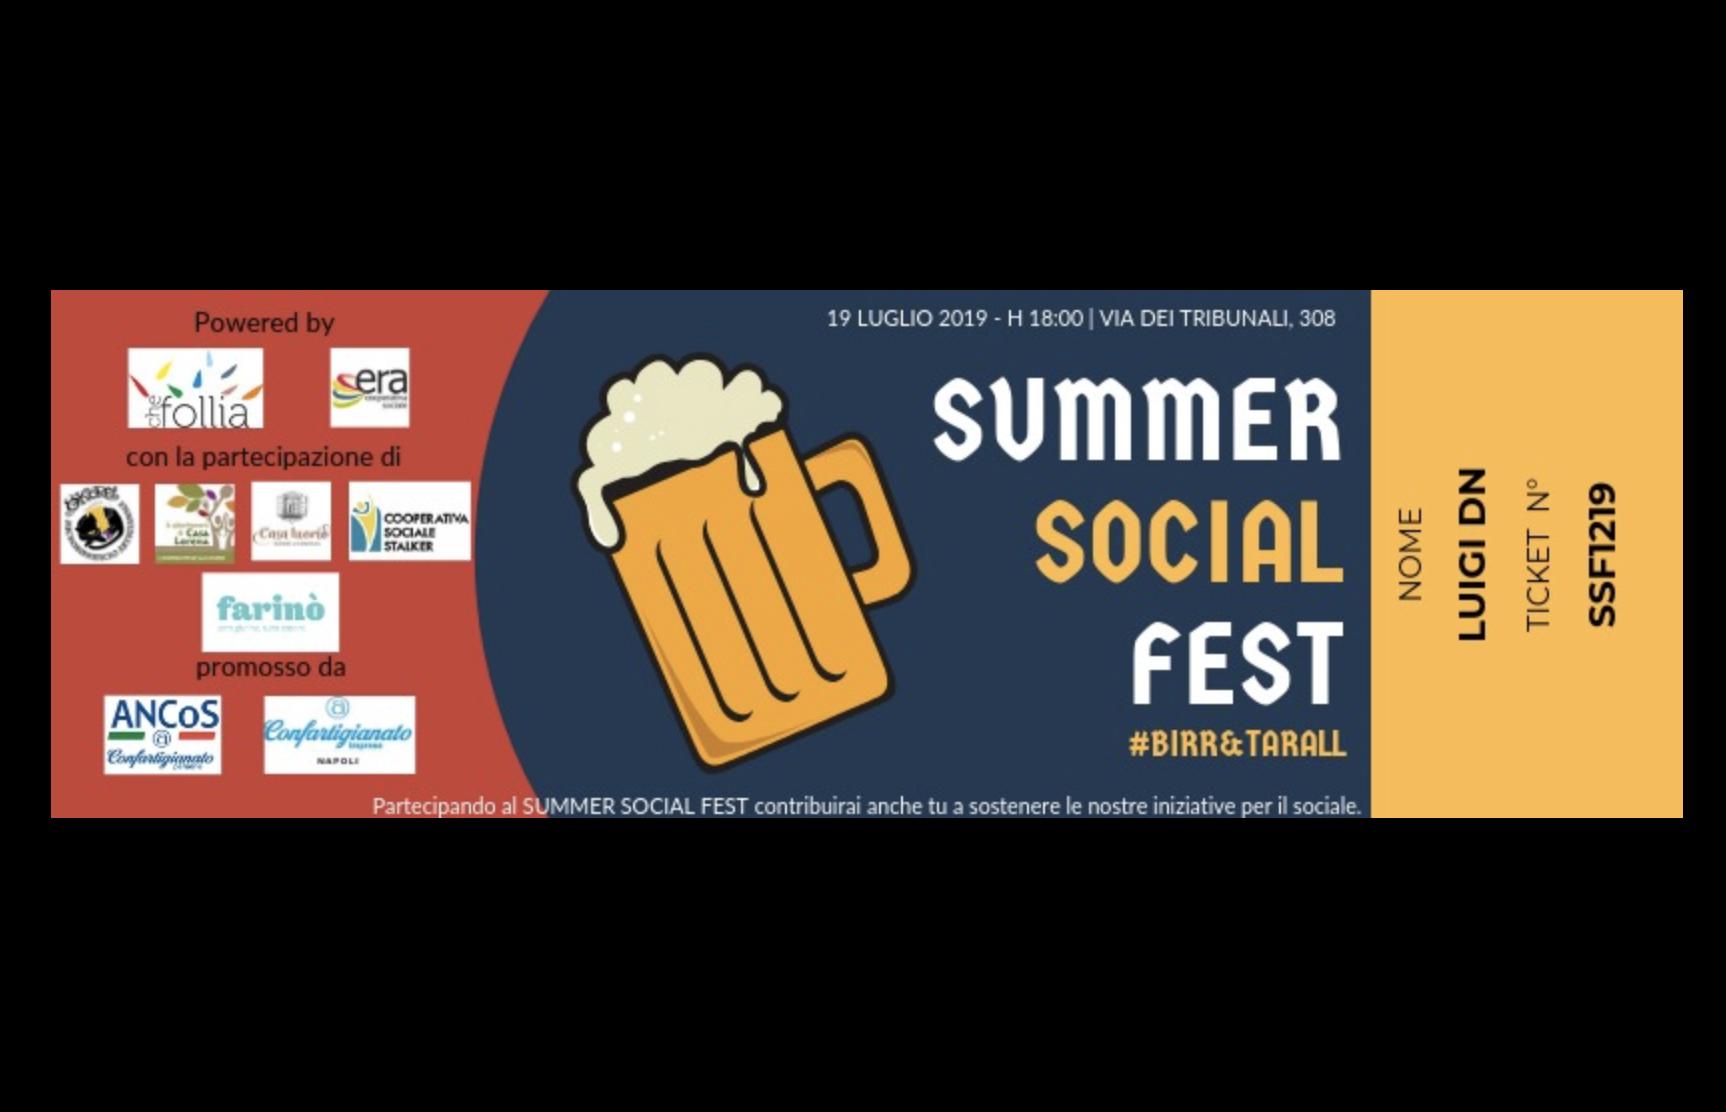 Summer Social Fest